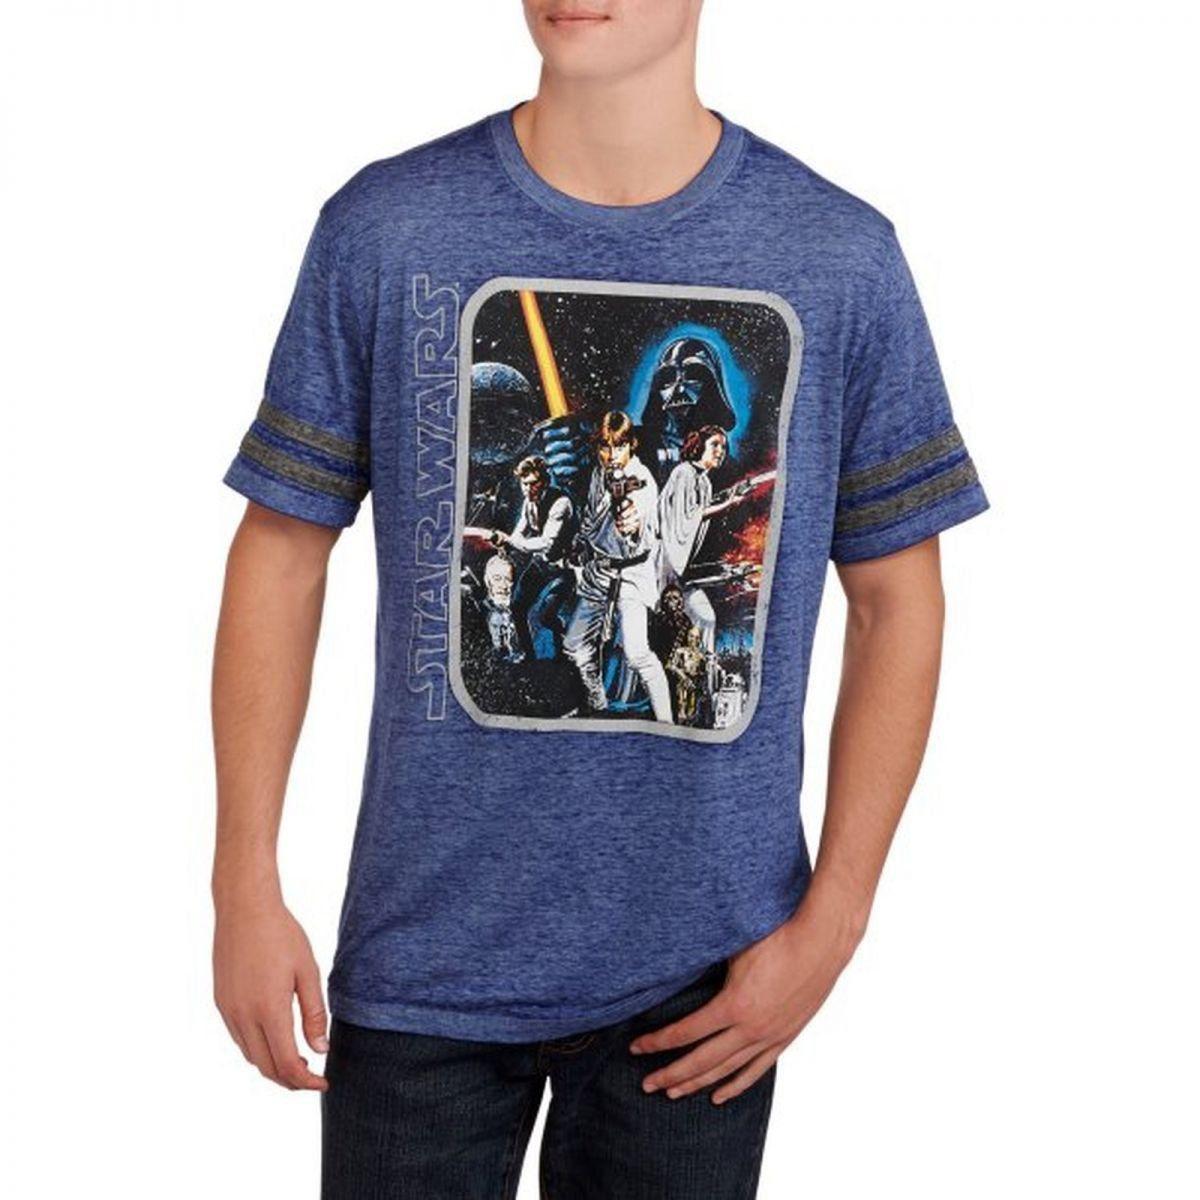 Camiseta Star Wars: Personagens